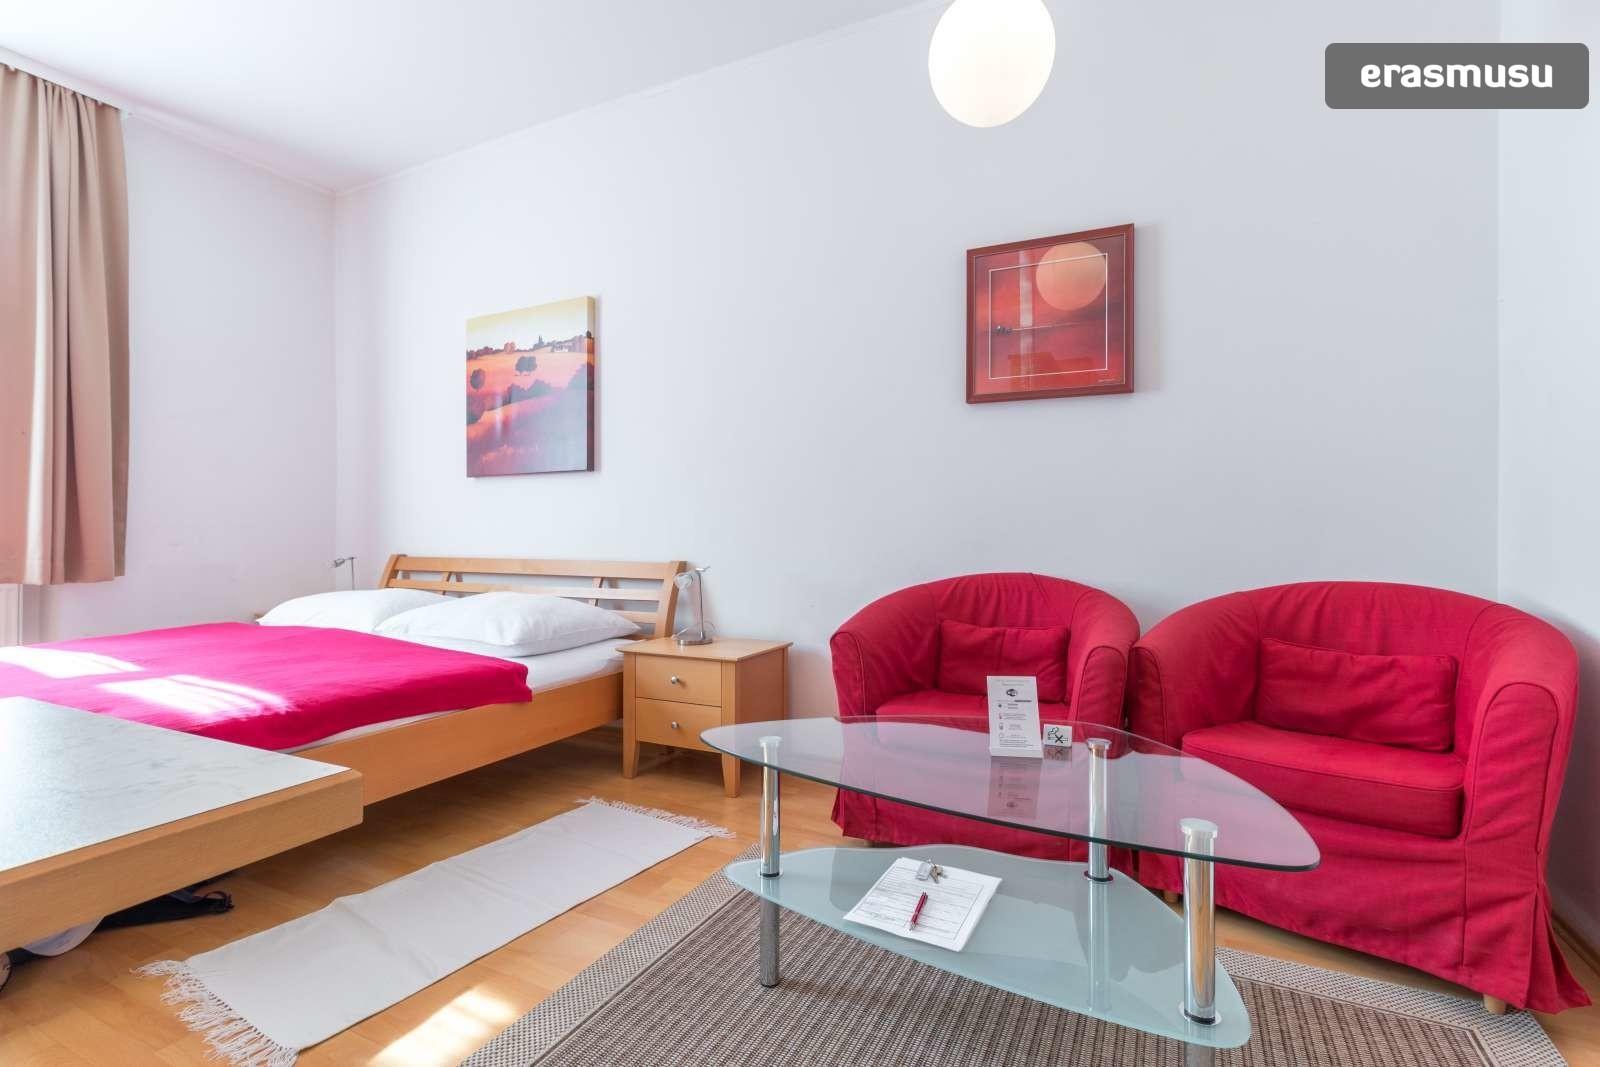 sunny-studio-apartment-rent-near-bohemian-prater-favoriten-54466